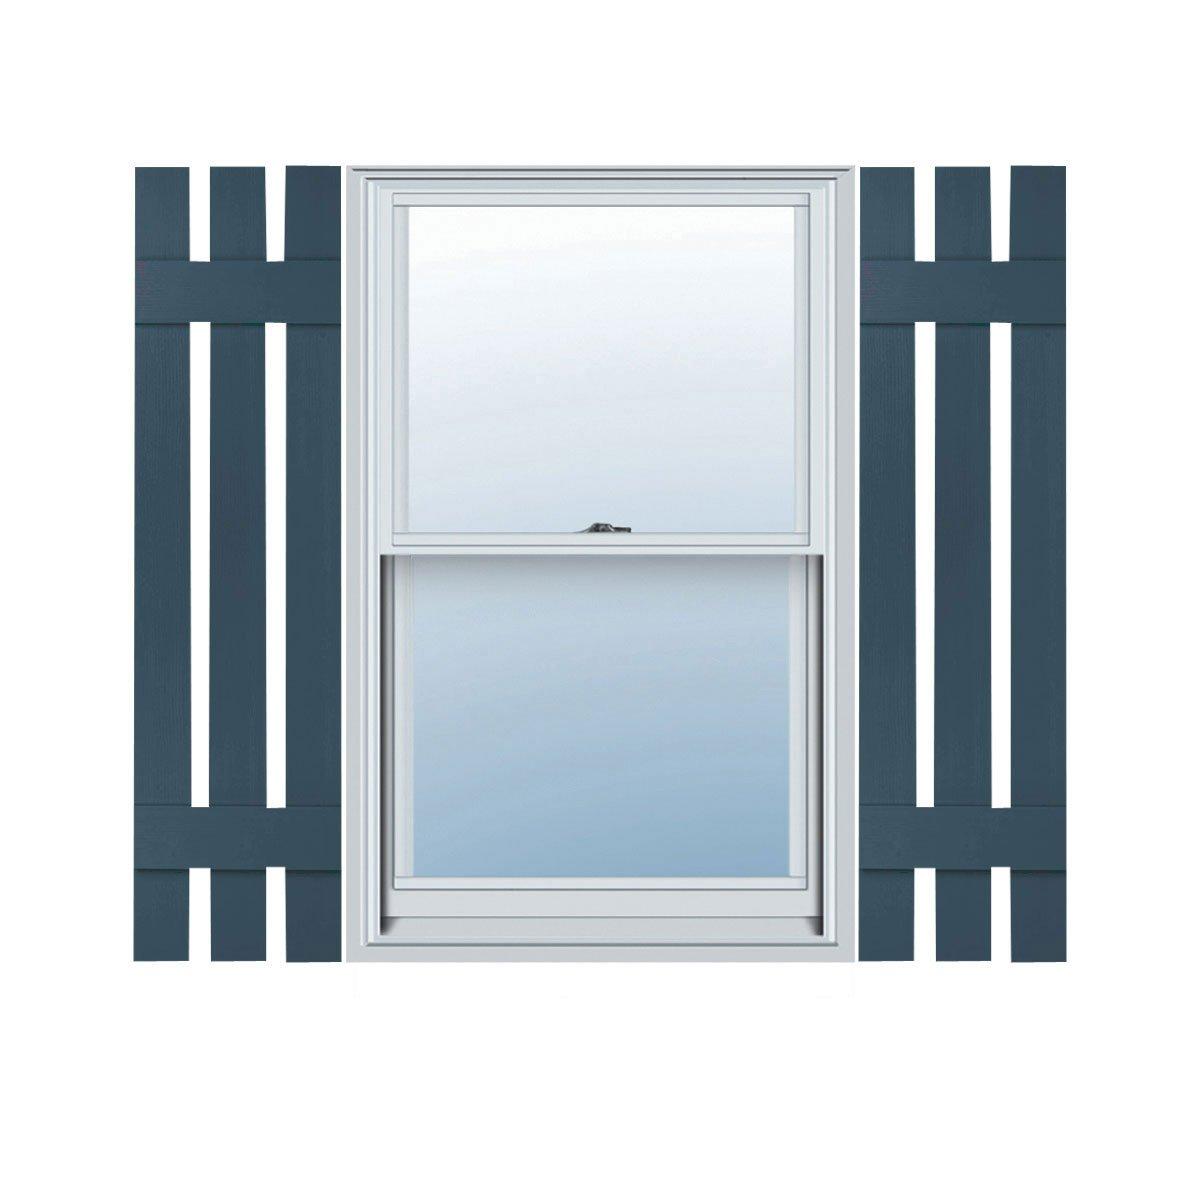 12''W x 47''H Builders Edge  Shutters (Per Pair), 036 - Classic Blue by Builders Edge